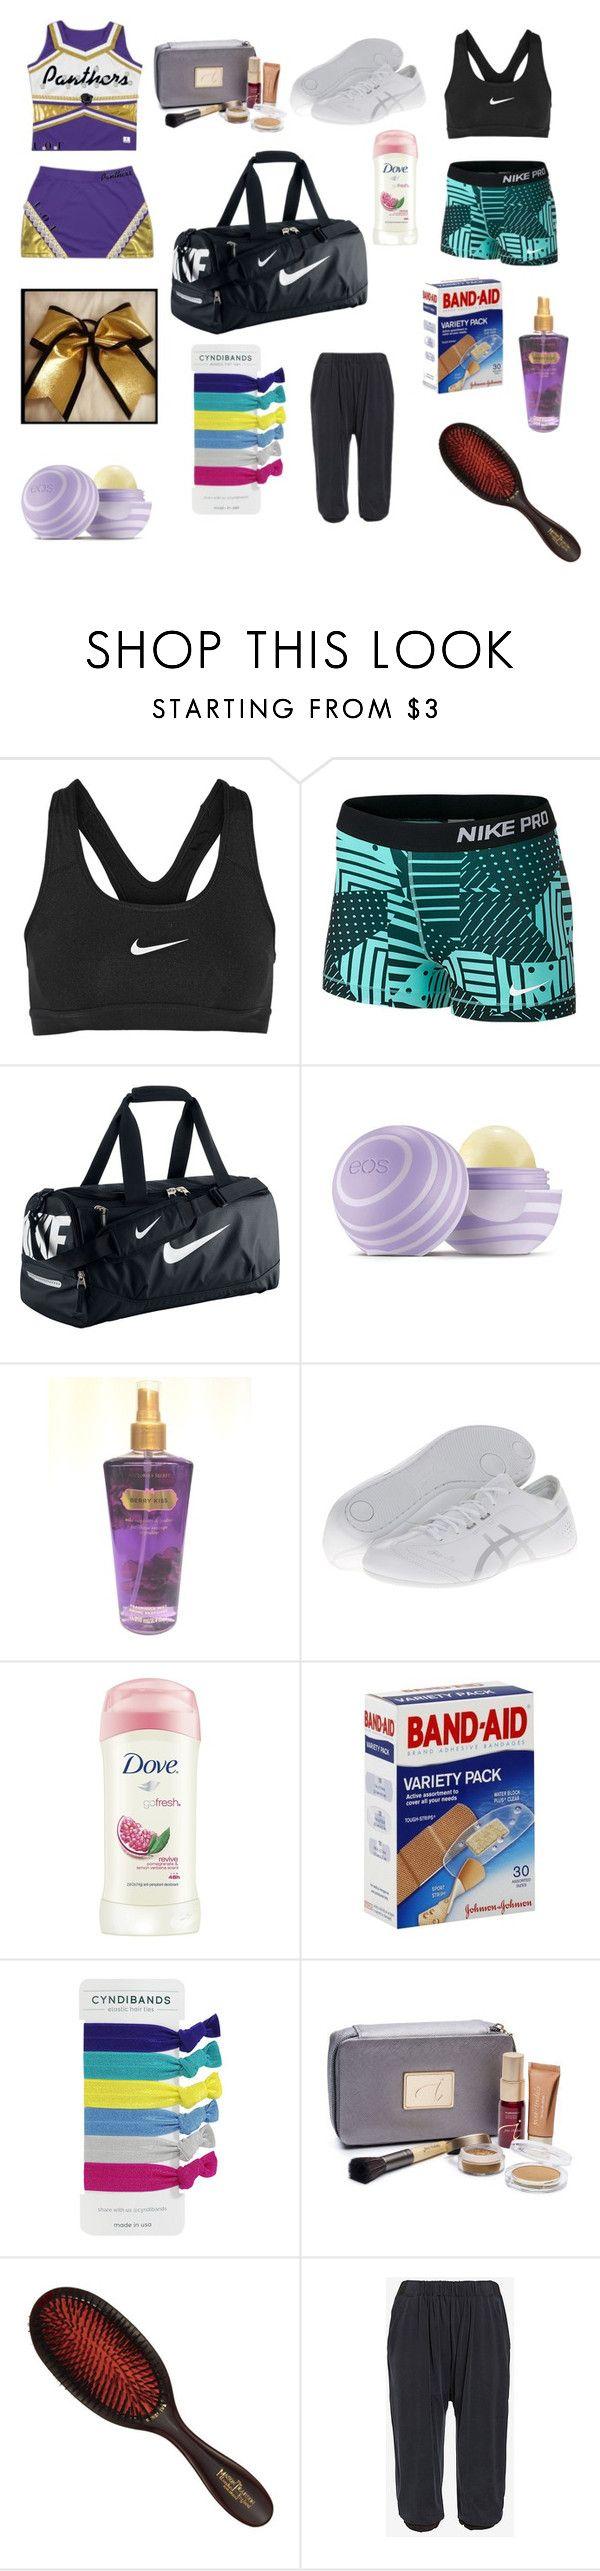 asics bag purple